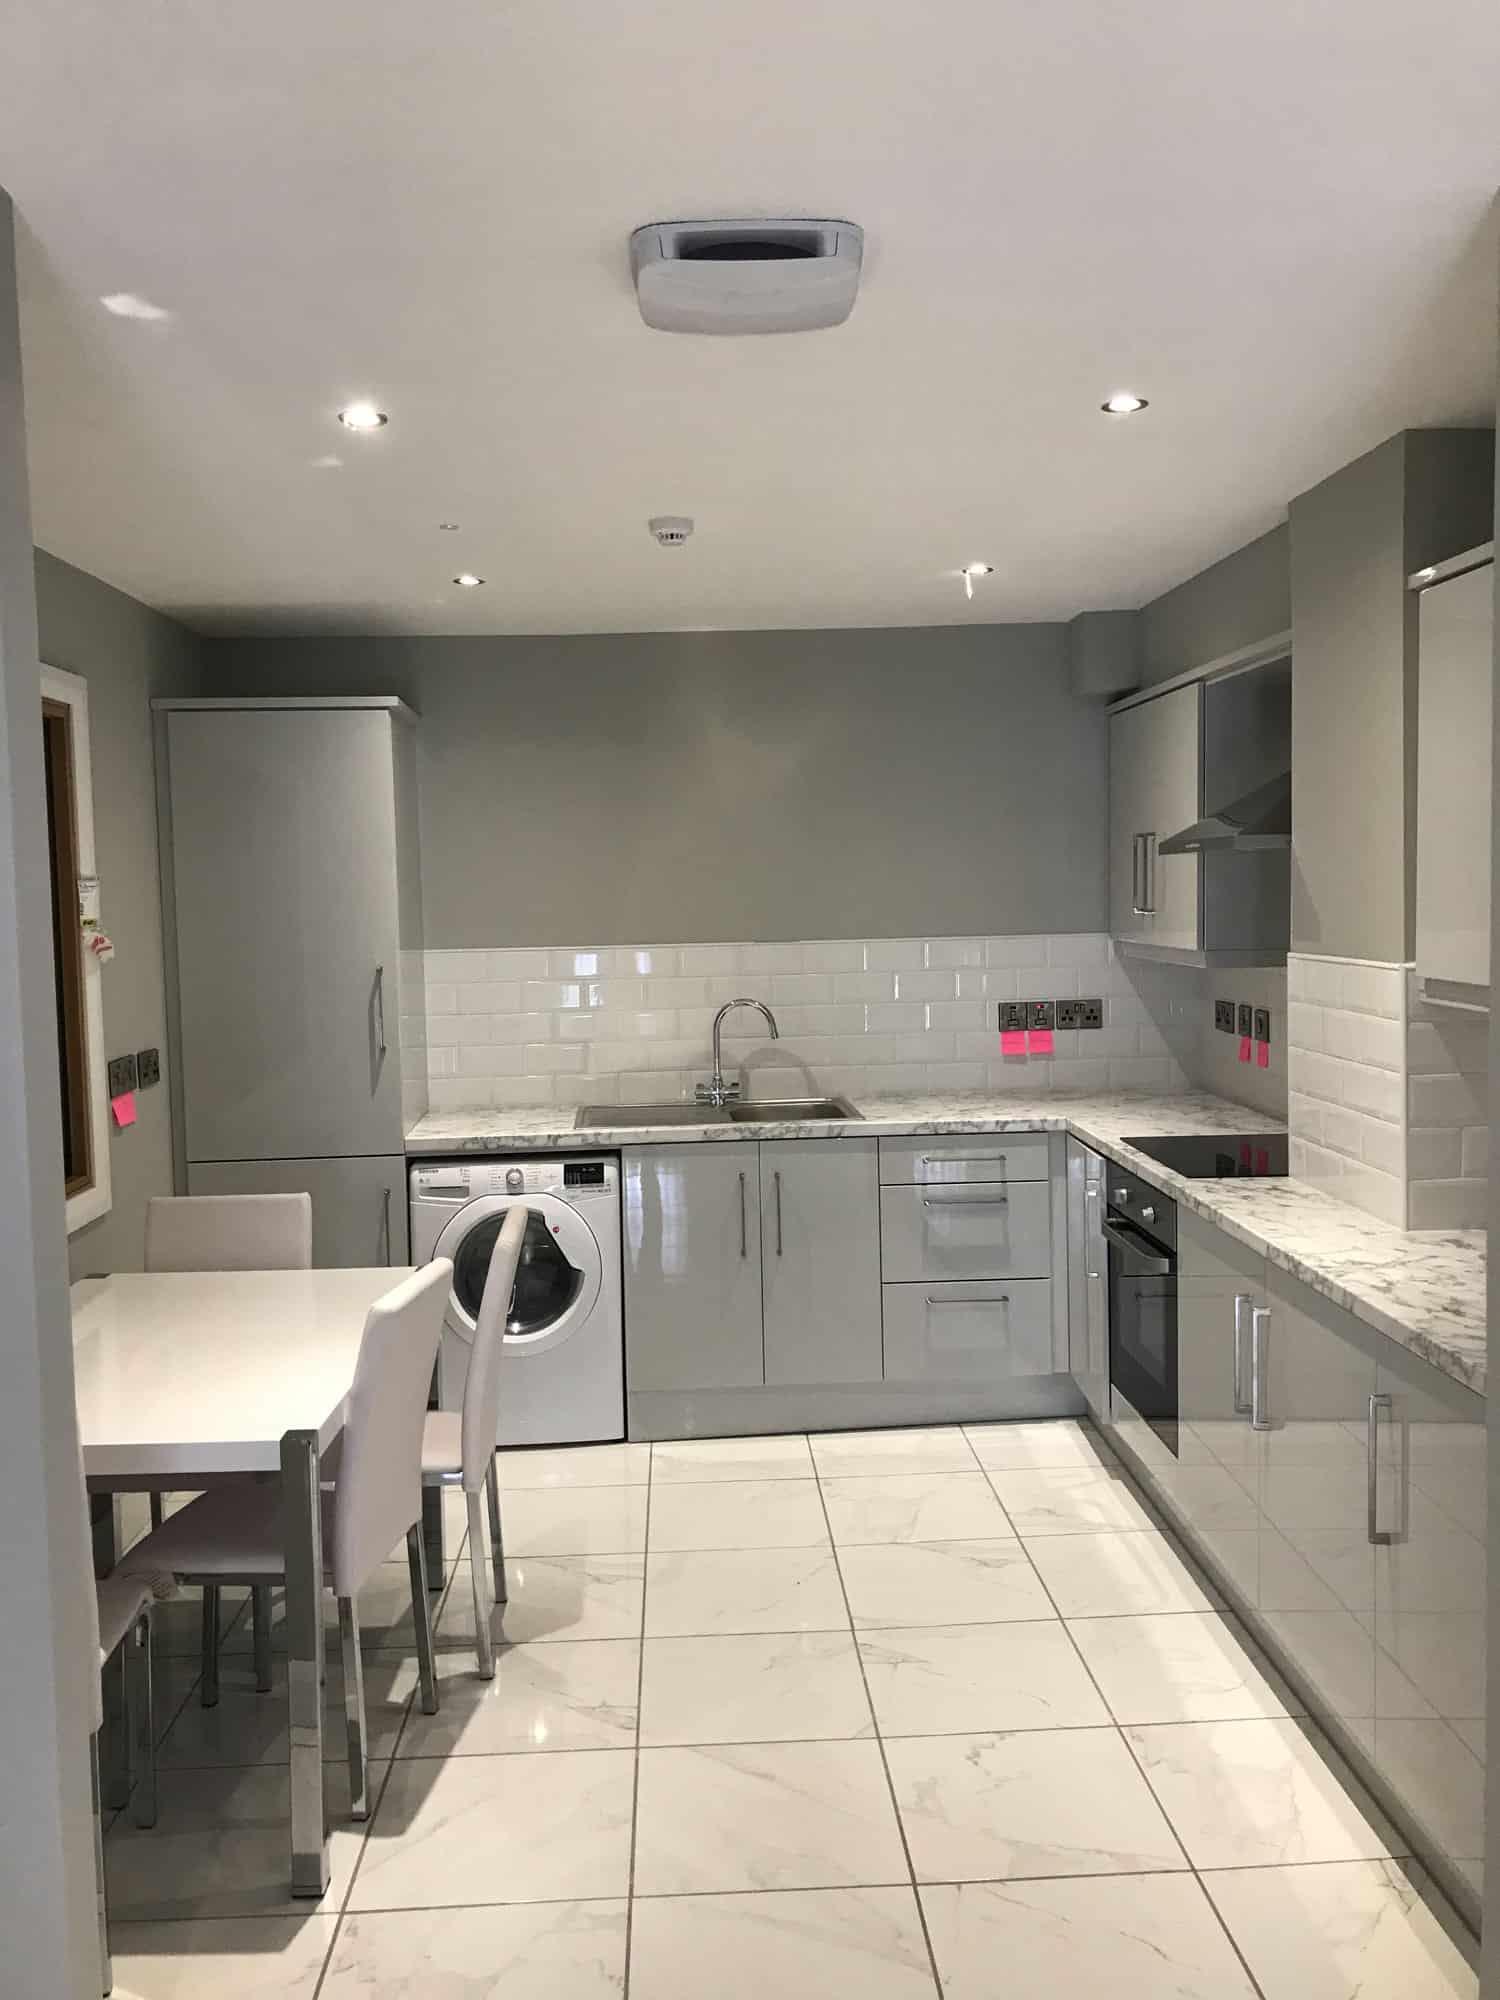 Two-Bedroom Kitchen Area Enniskillen Flats